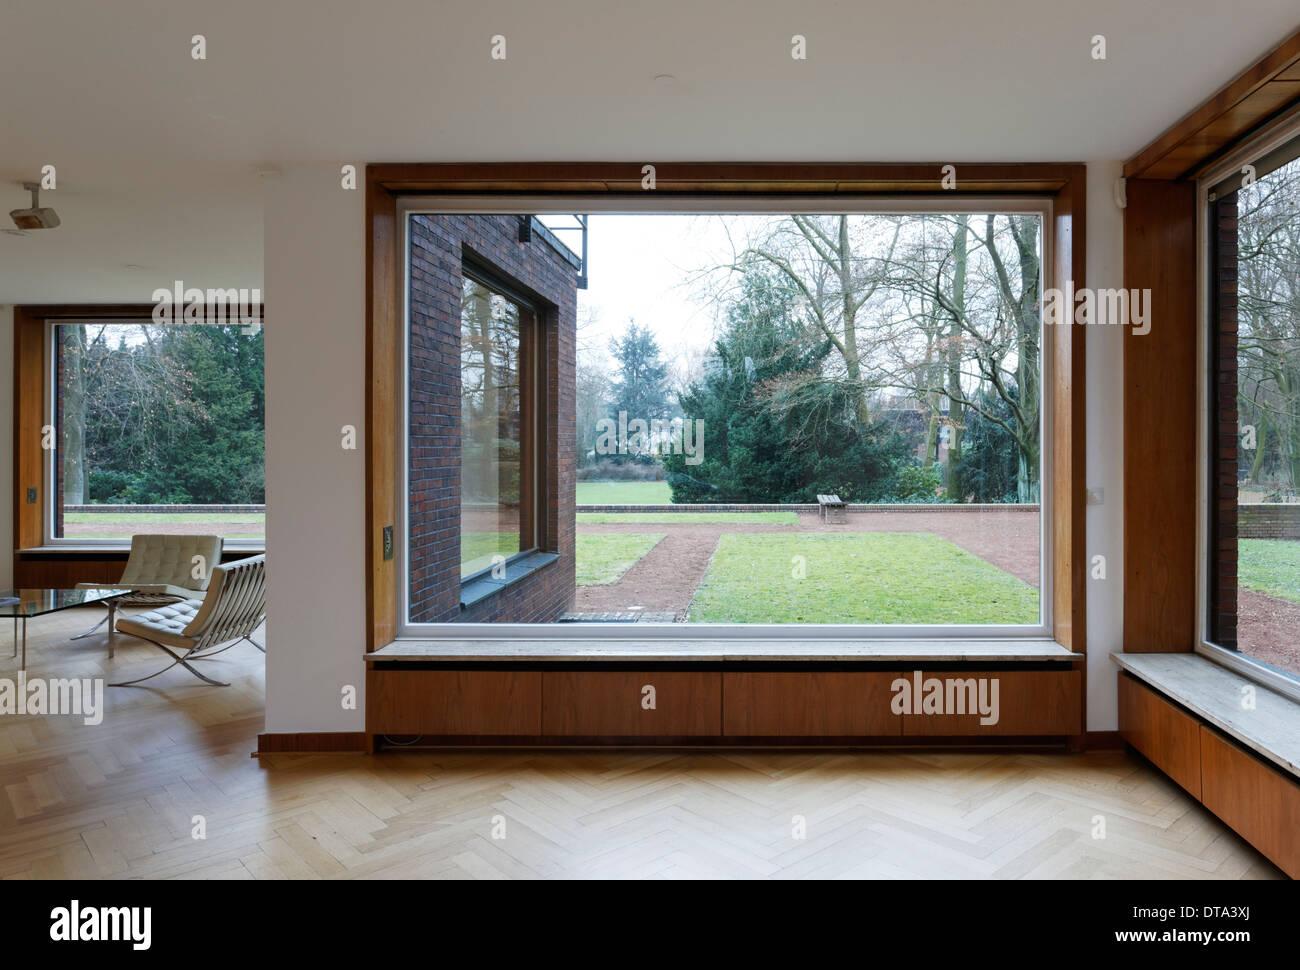 Krefeld Haus Lange Fotos e Imágenes de stock - Alamy